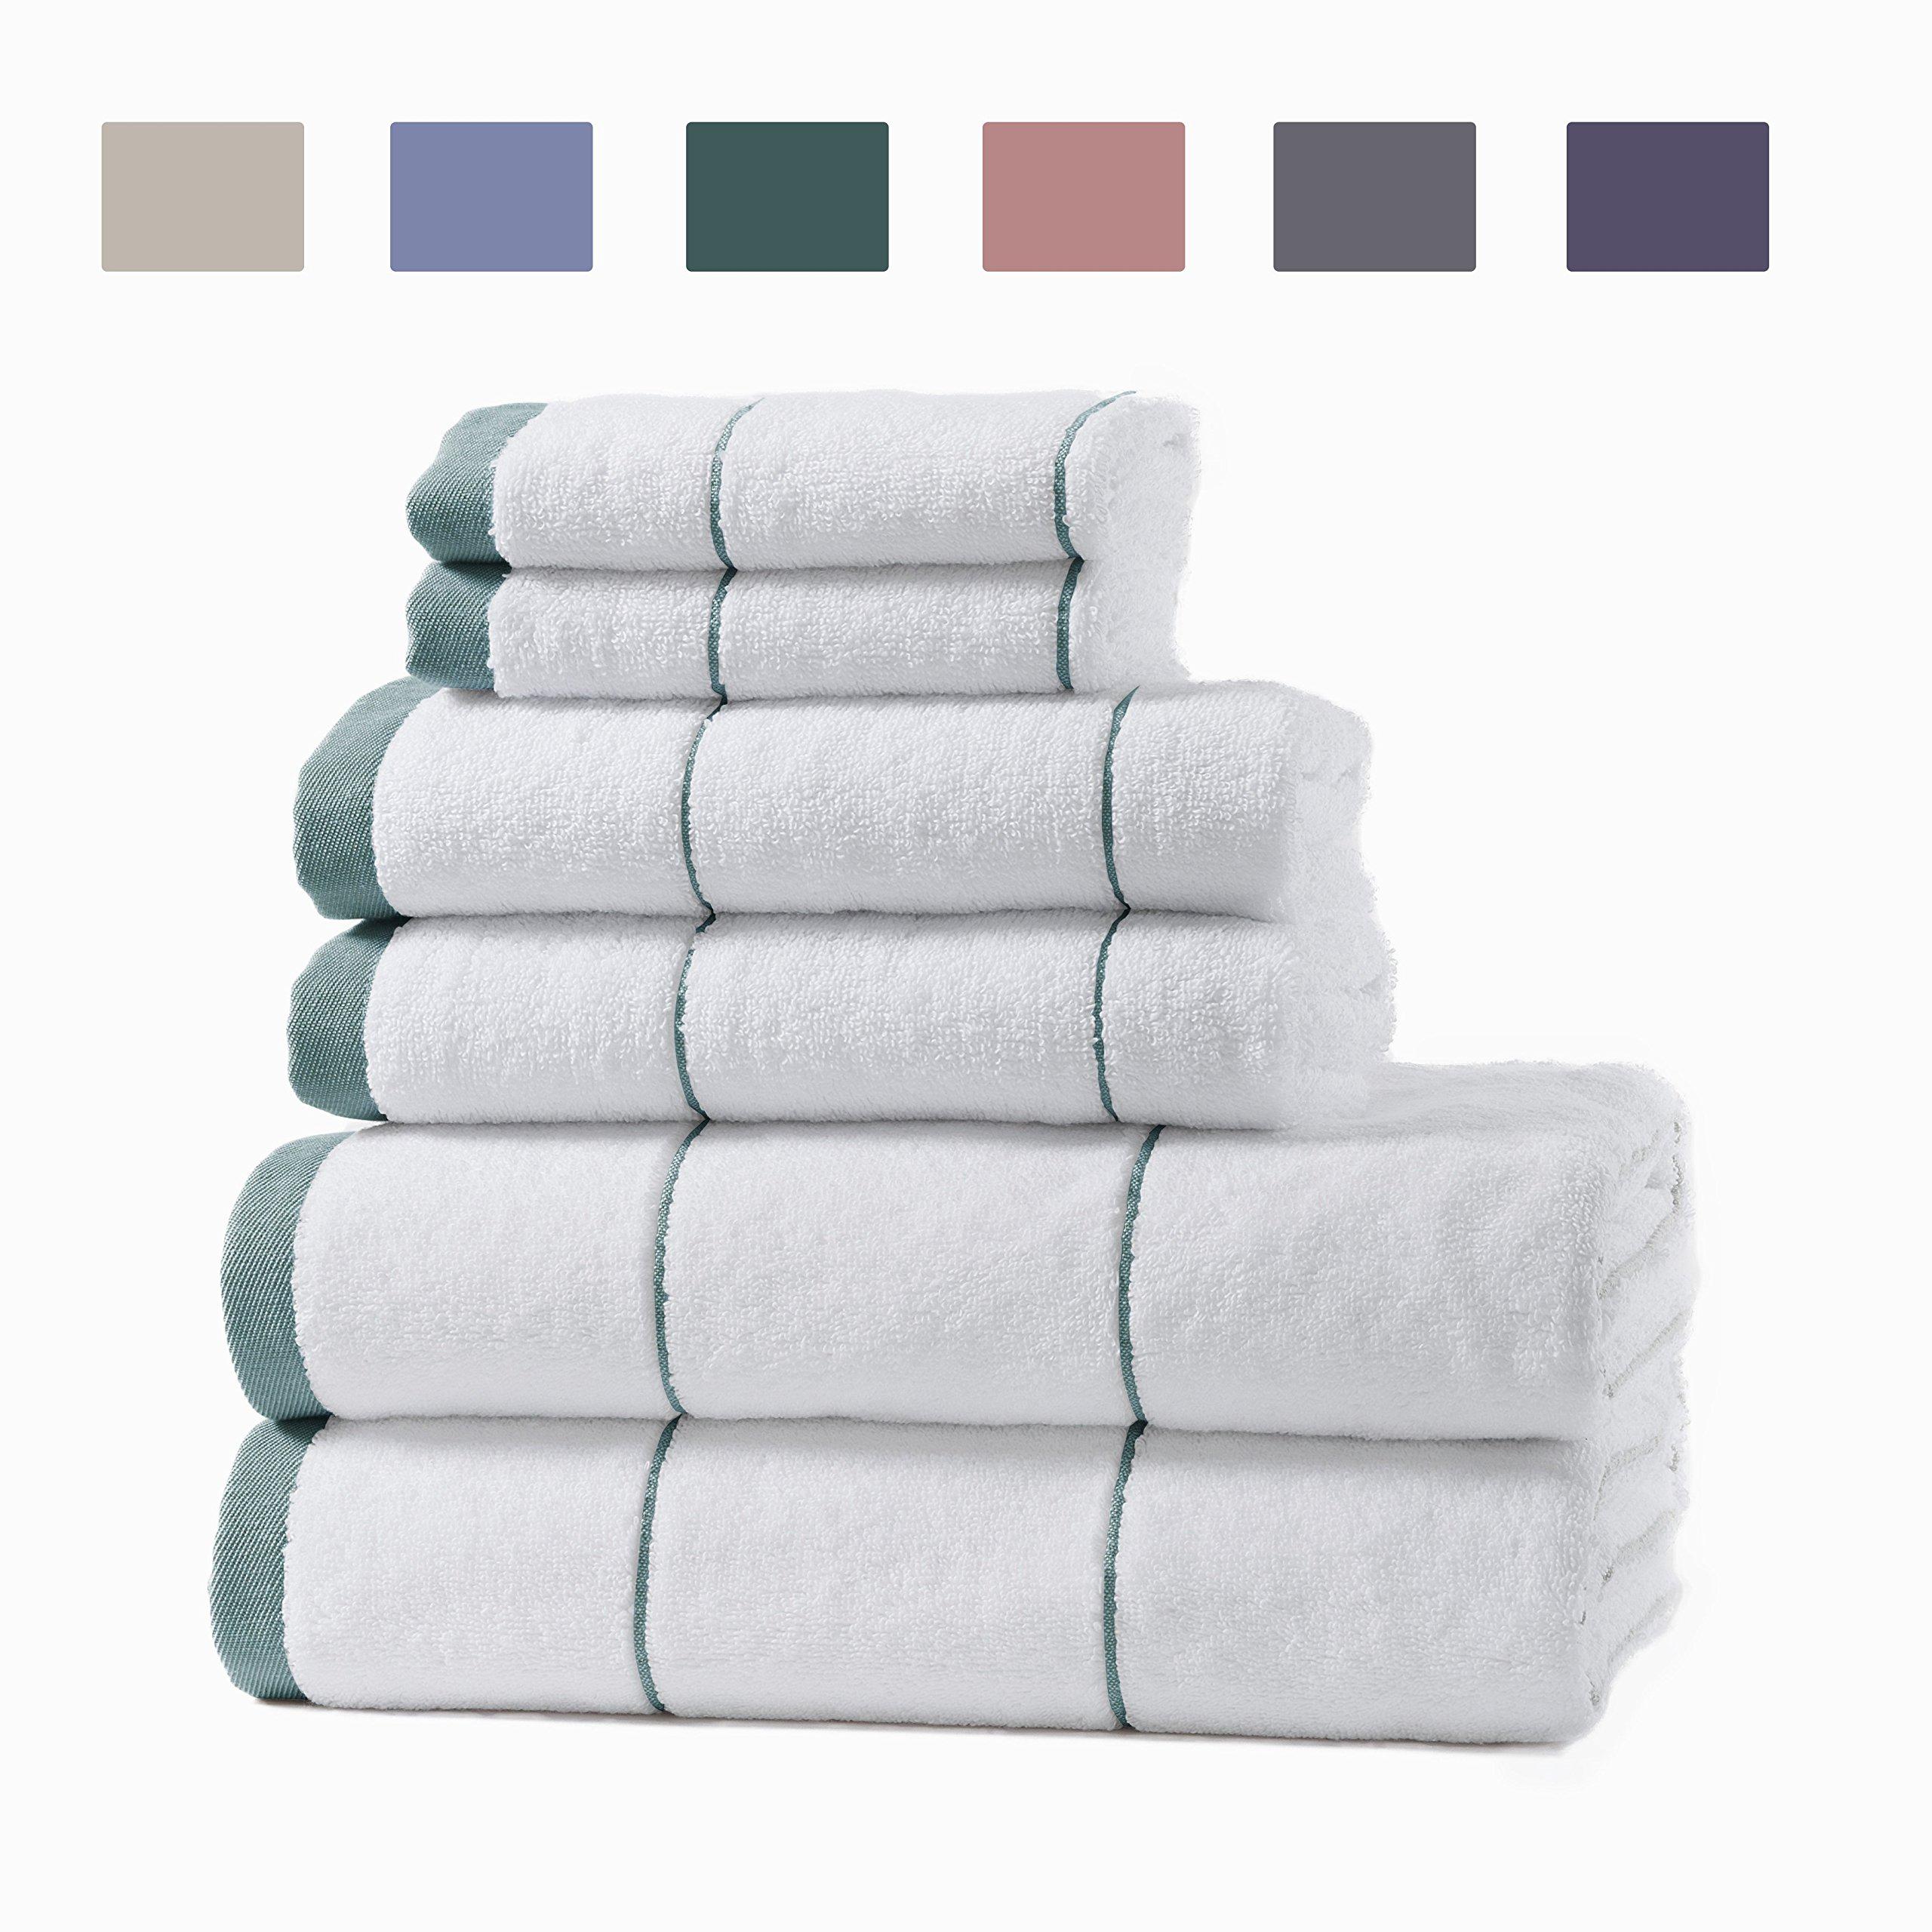 Home Fashion Designs 100% Turkish Cotton Spa Bath Towel Set. Includes Bath Towels, Hand Towels and Washcloths. Roka by (Jade Green)